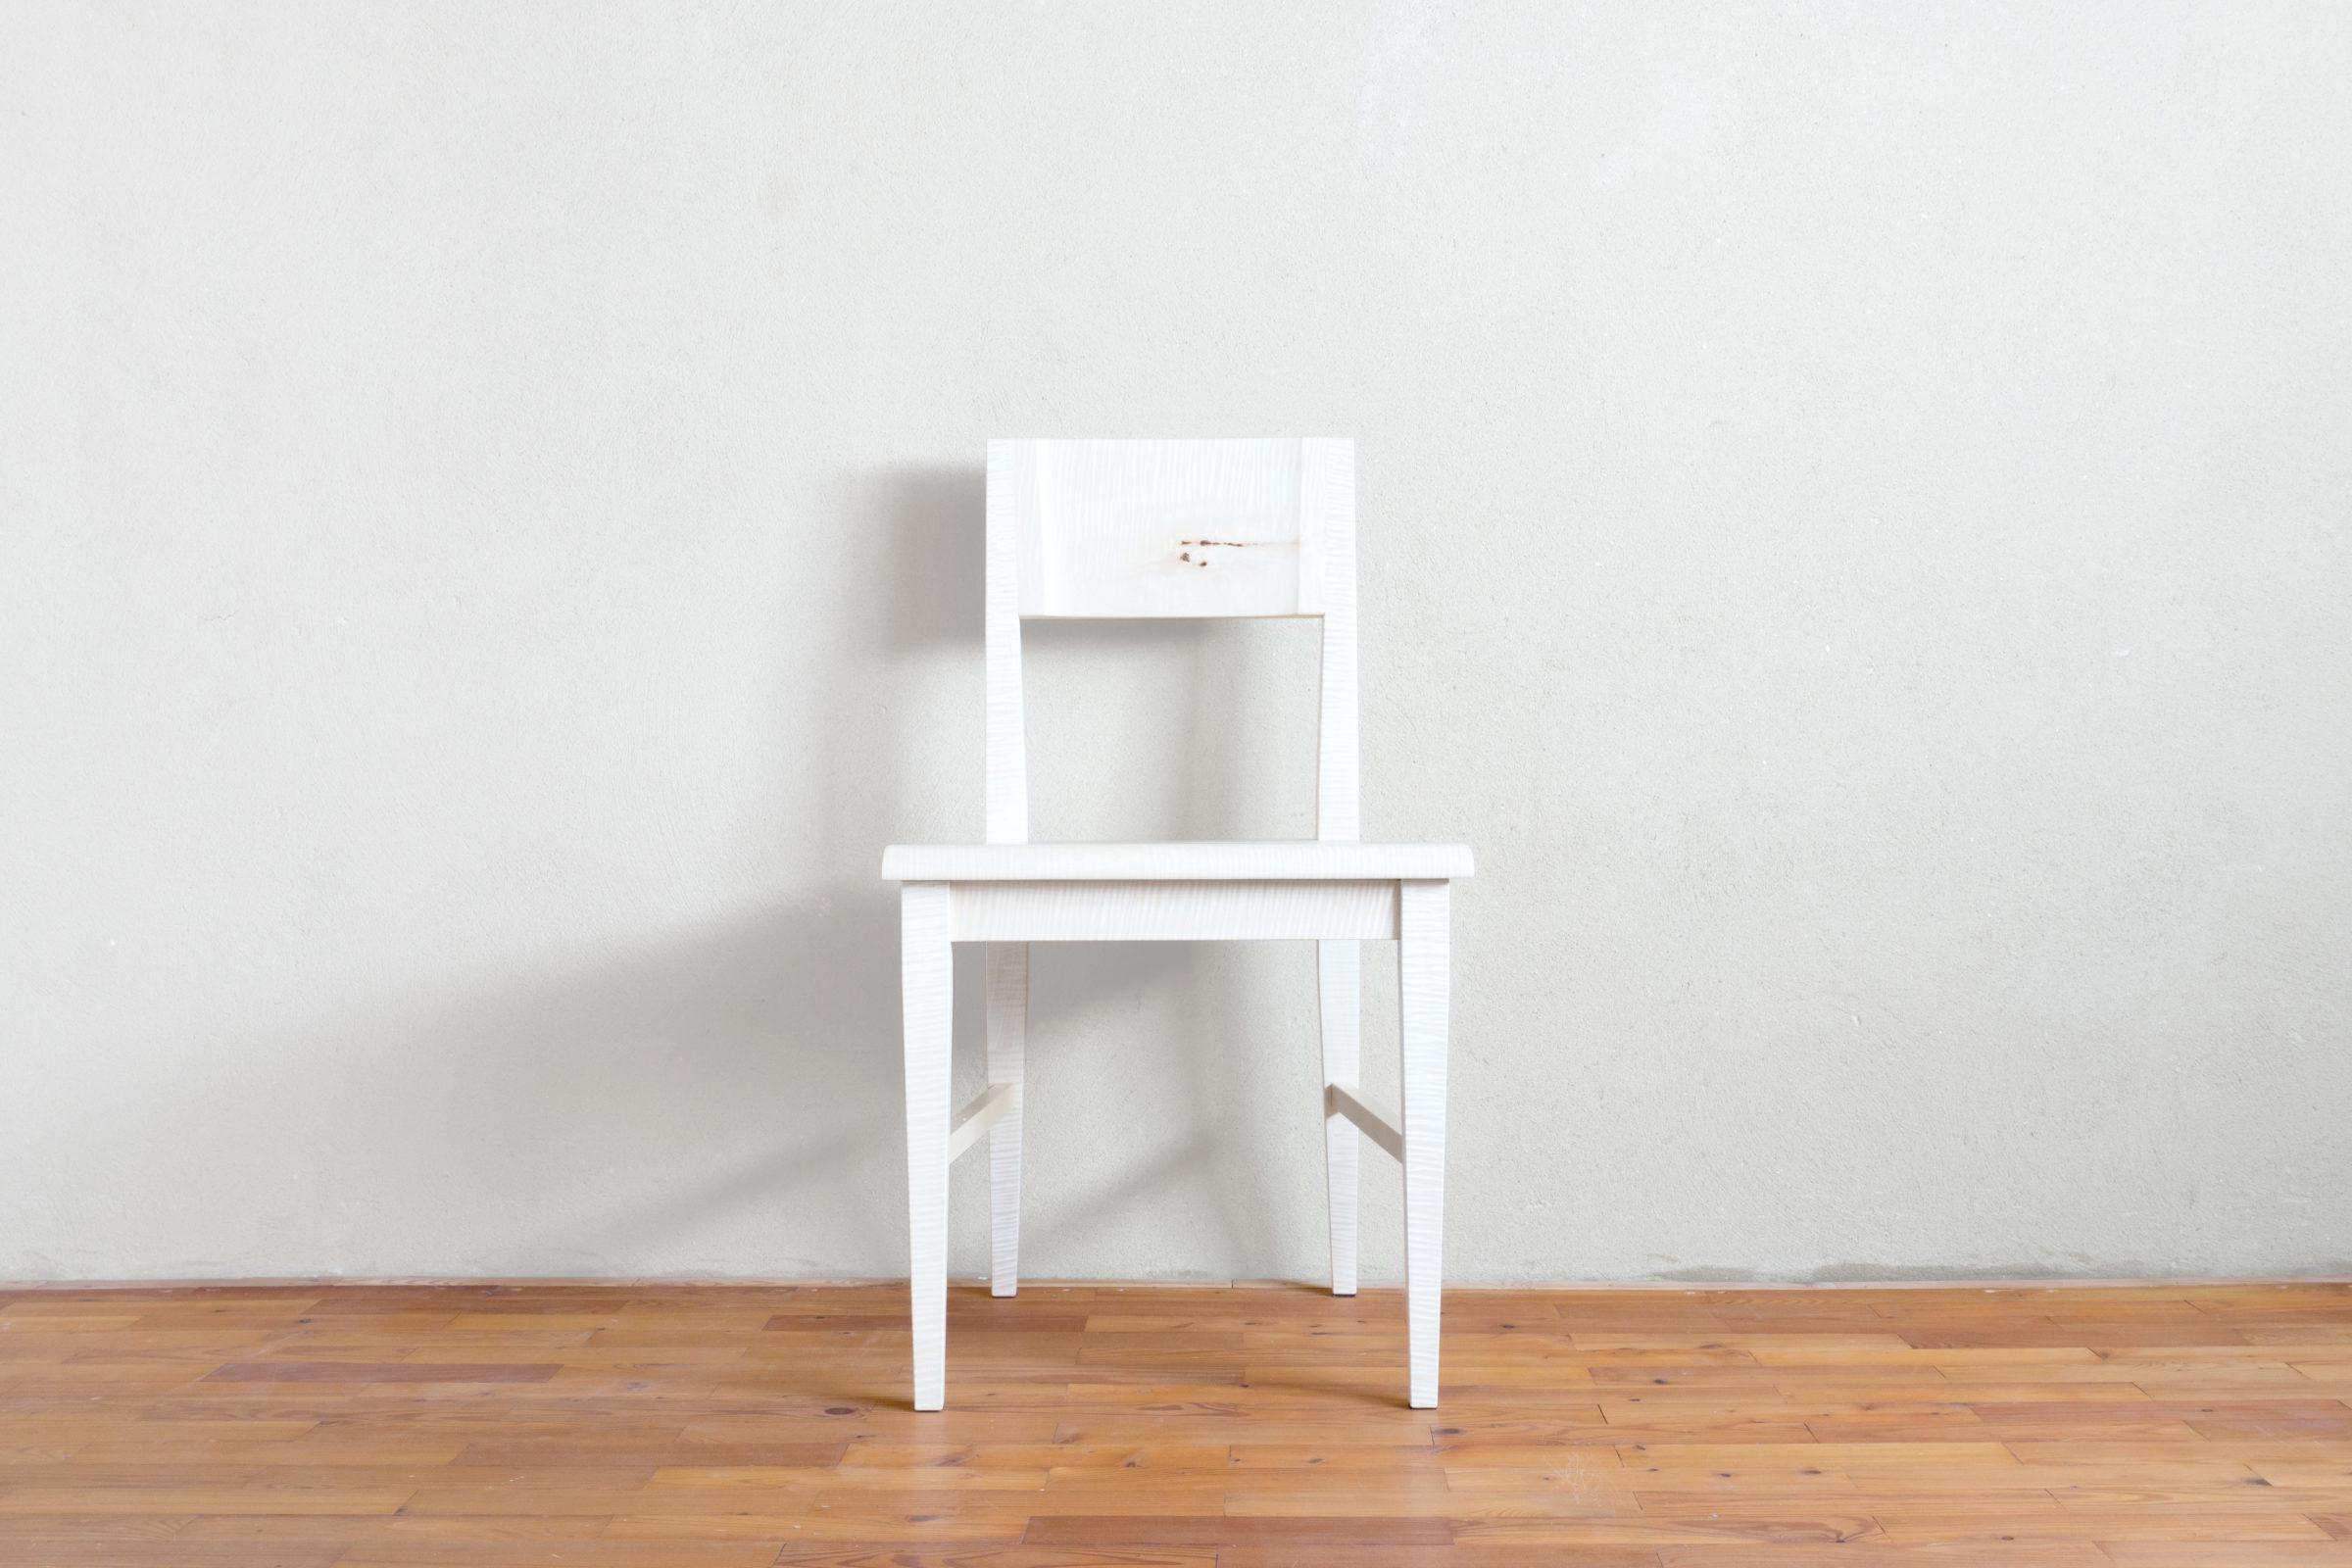 Stuhl, Massivholzmöbel handgemacht, Hochwertige Möbel aus Massivholz, Holzoberflächen handgehobelt, Einzelmöbelstücke, The Trees of Life